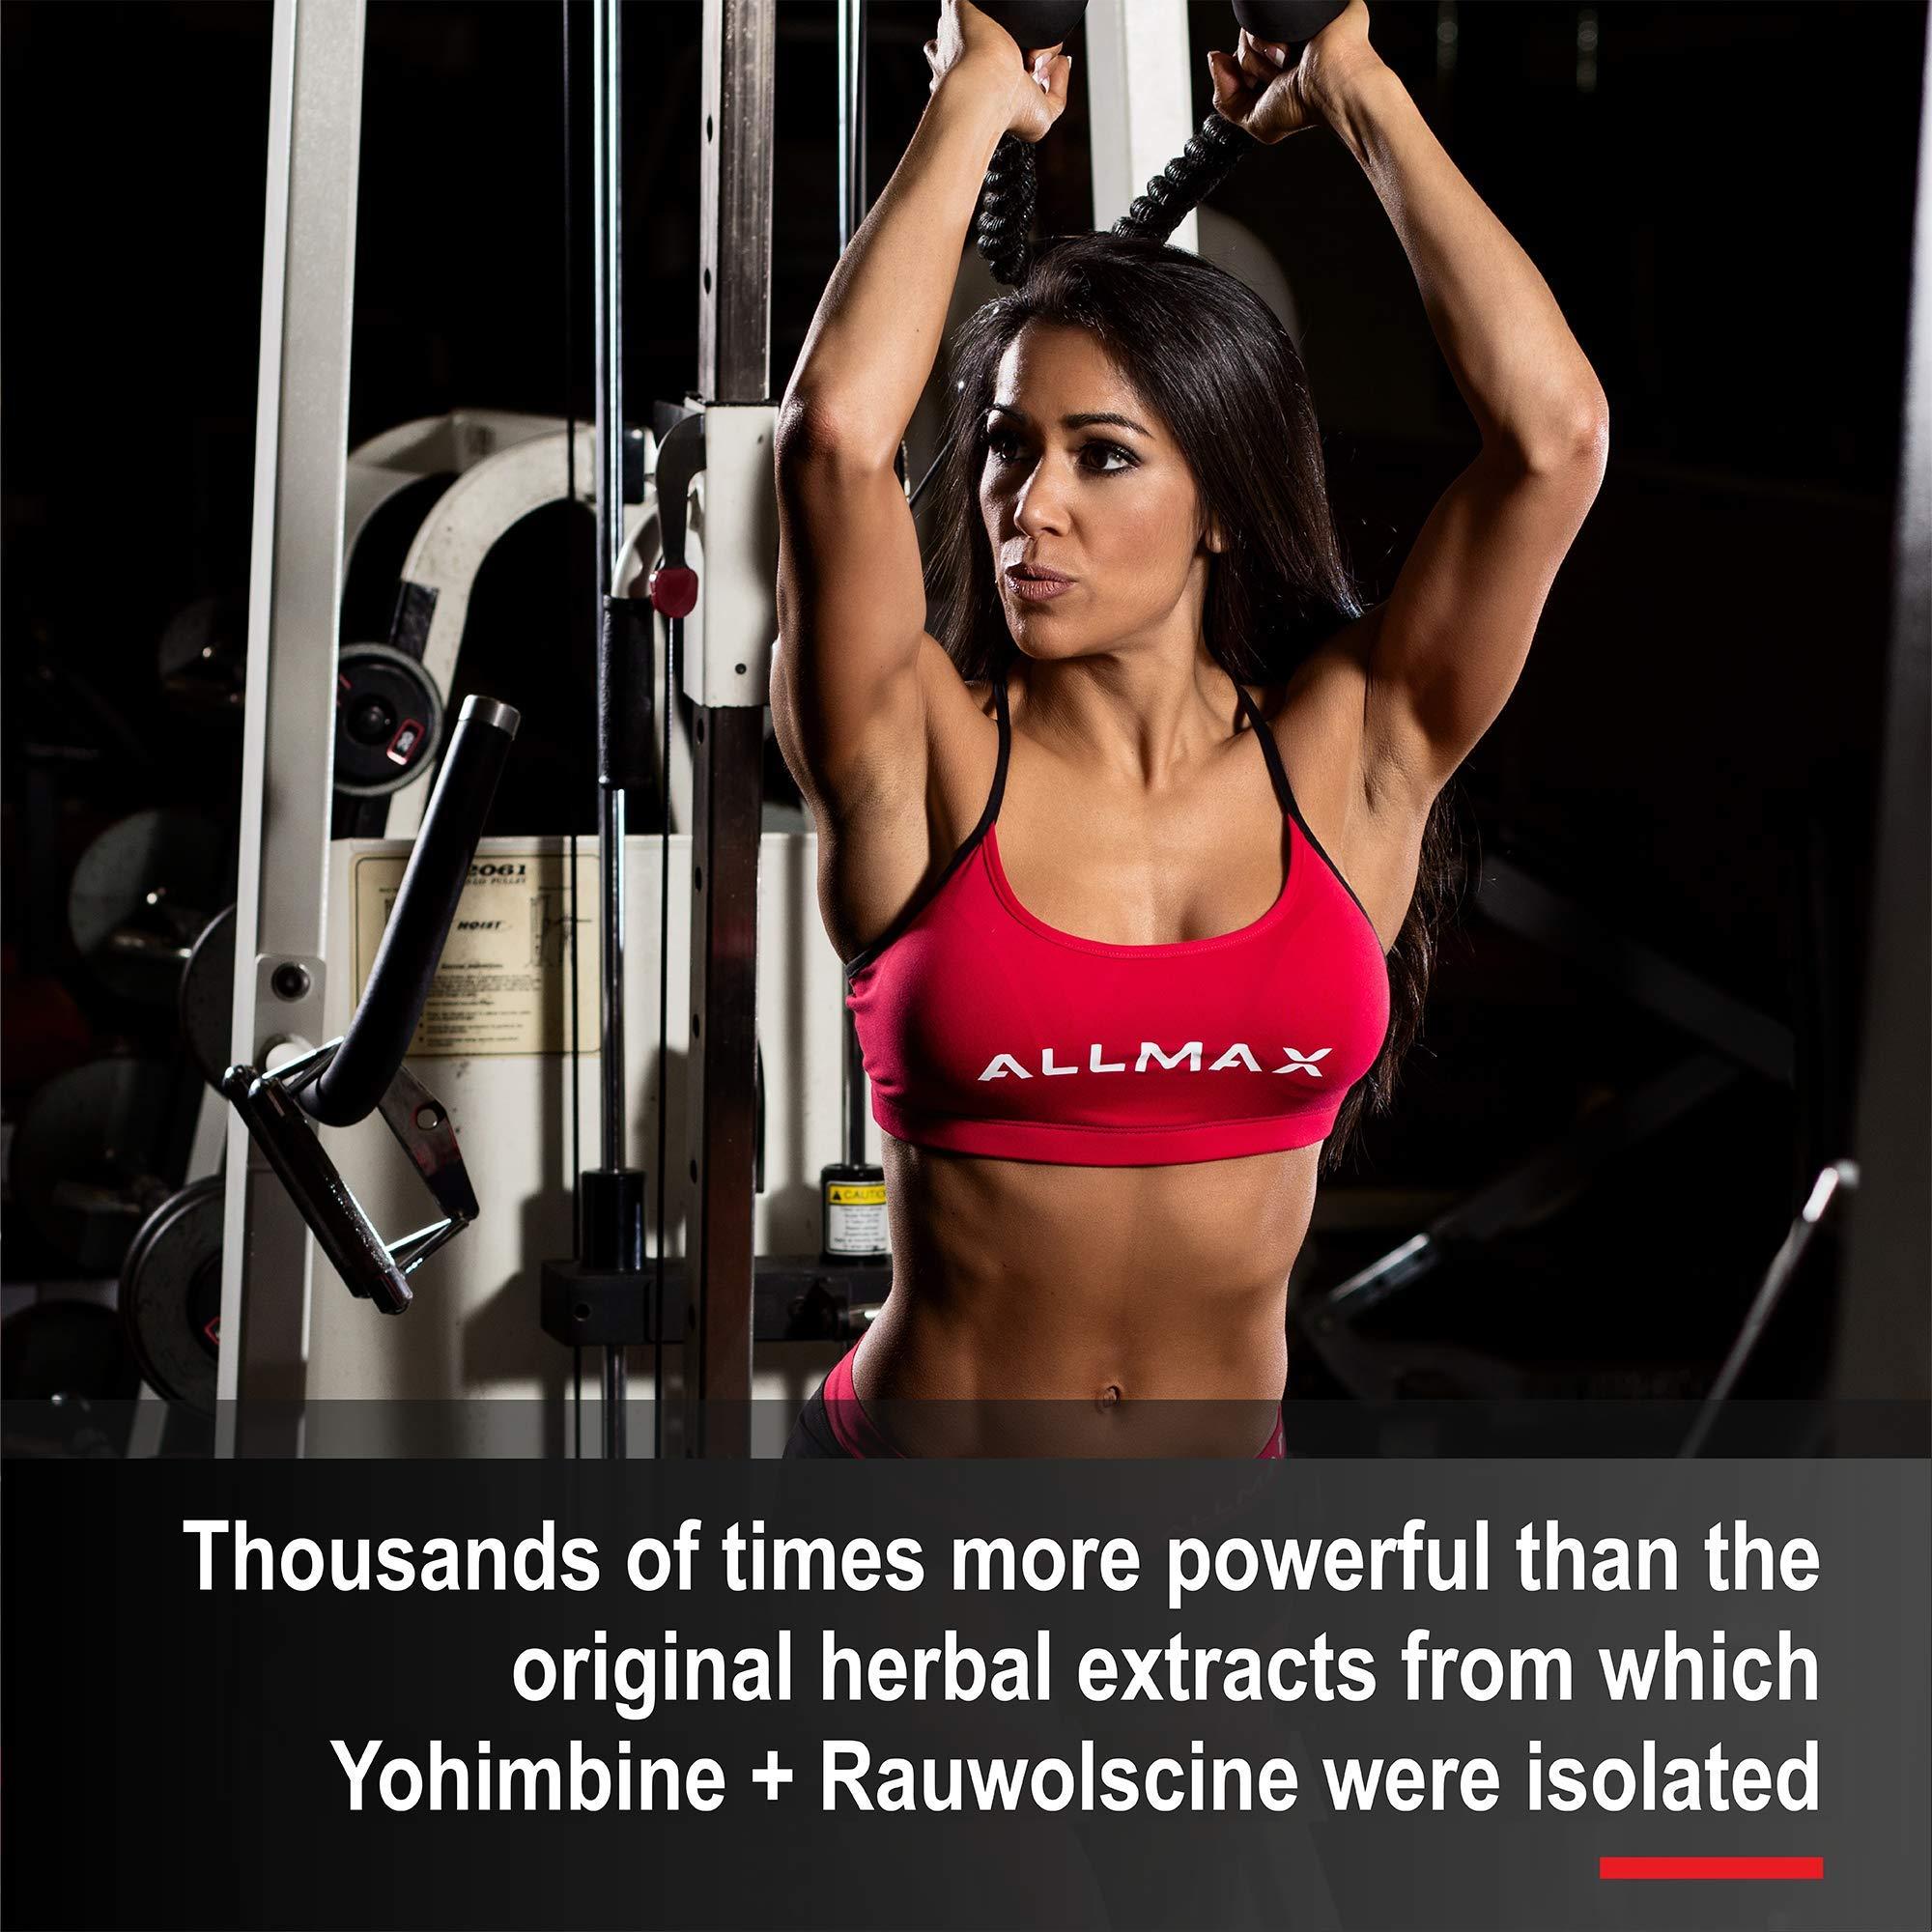 ALLMAX Nutrition Yohimbine + Rauwolscine, 60 Capsules by ALLMAX Nutrition (Image #3)